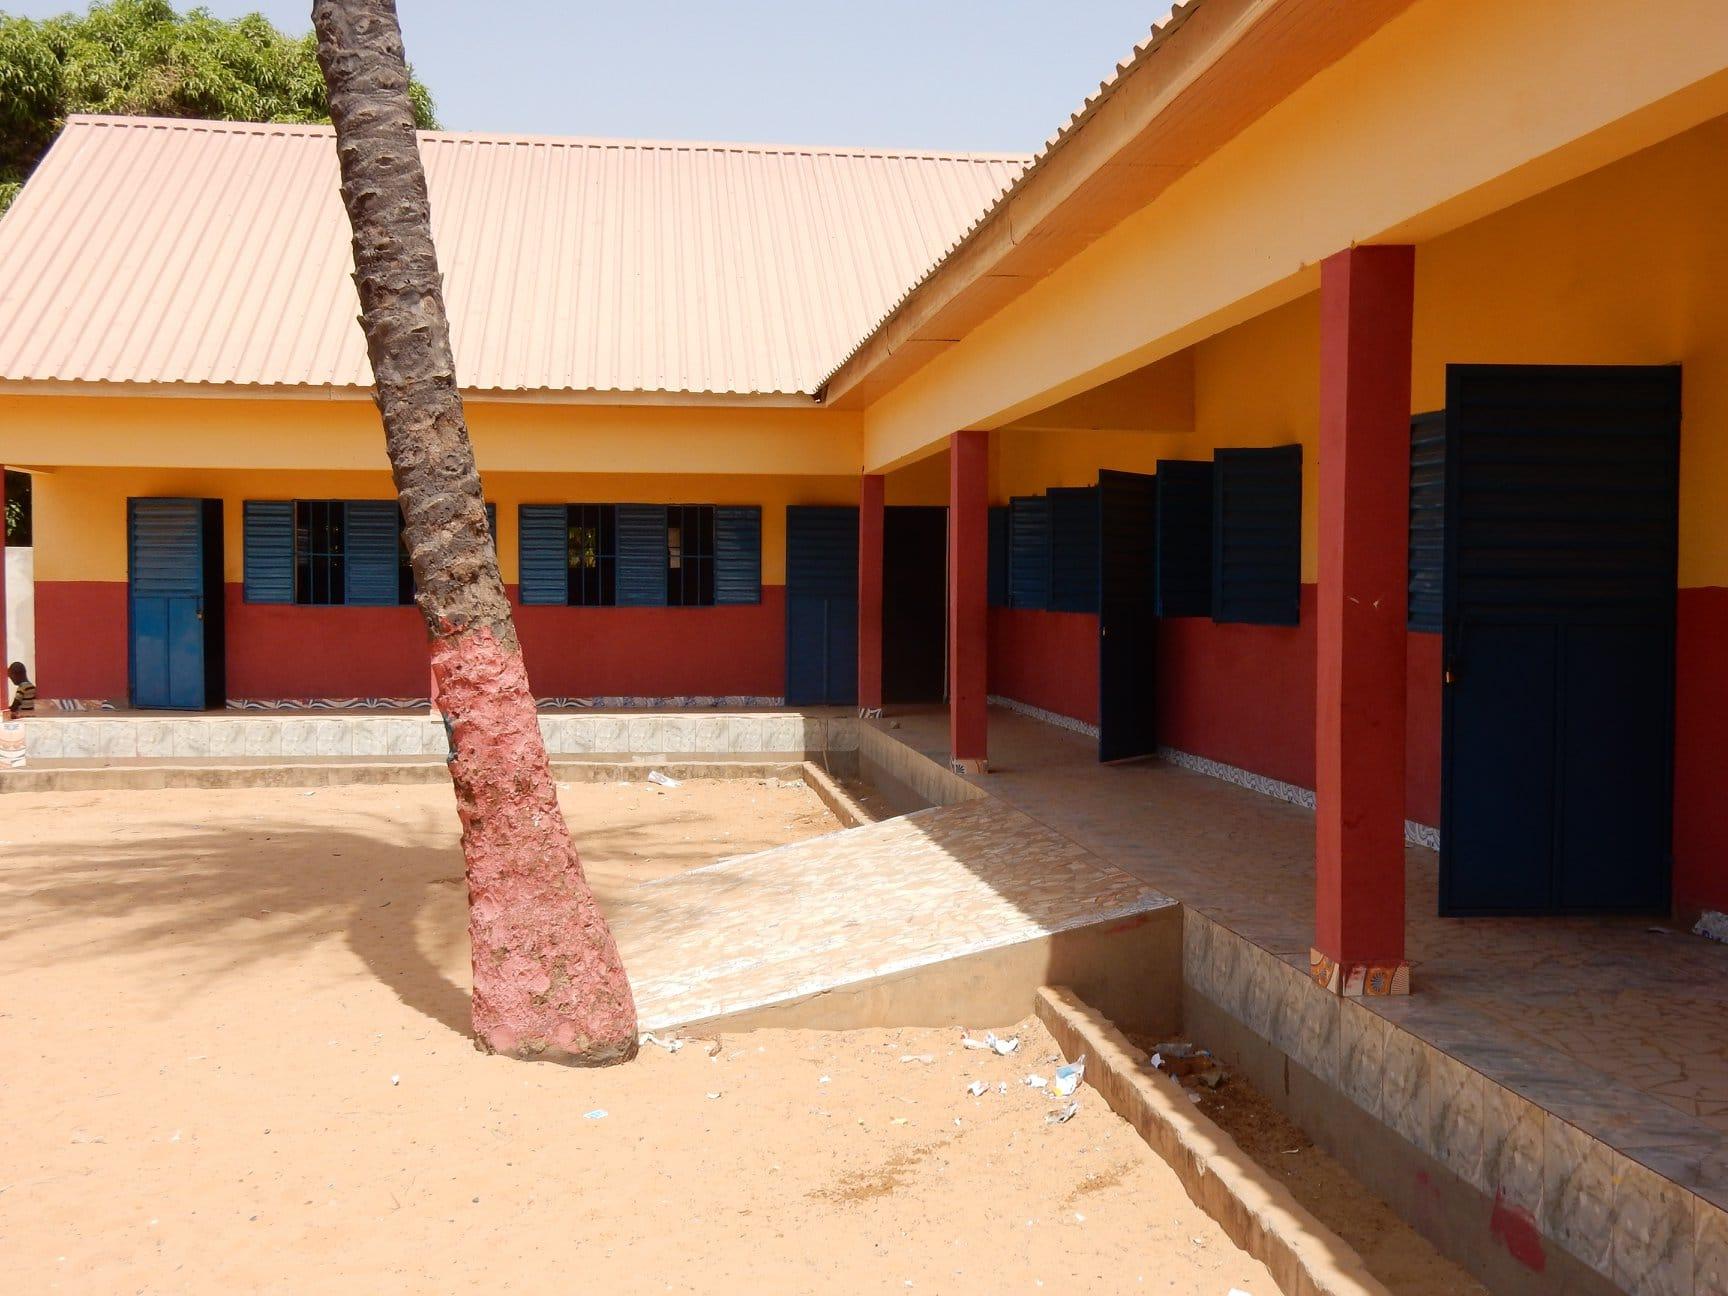 Sawallah Nursery and Primary School